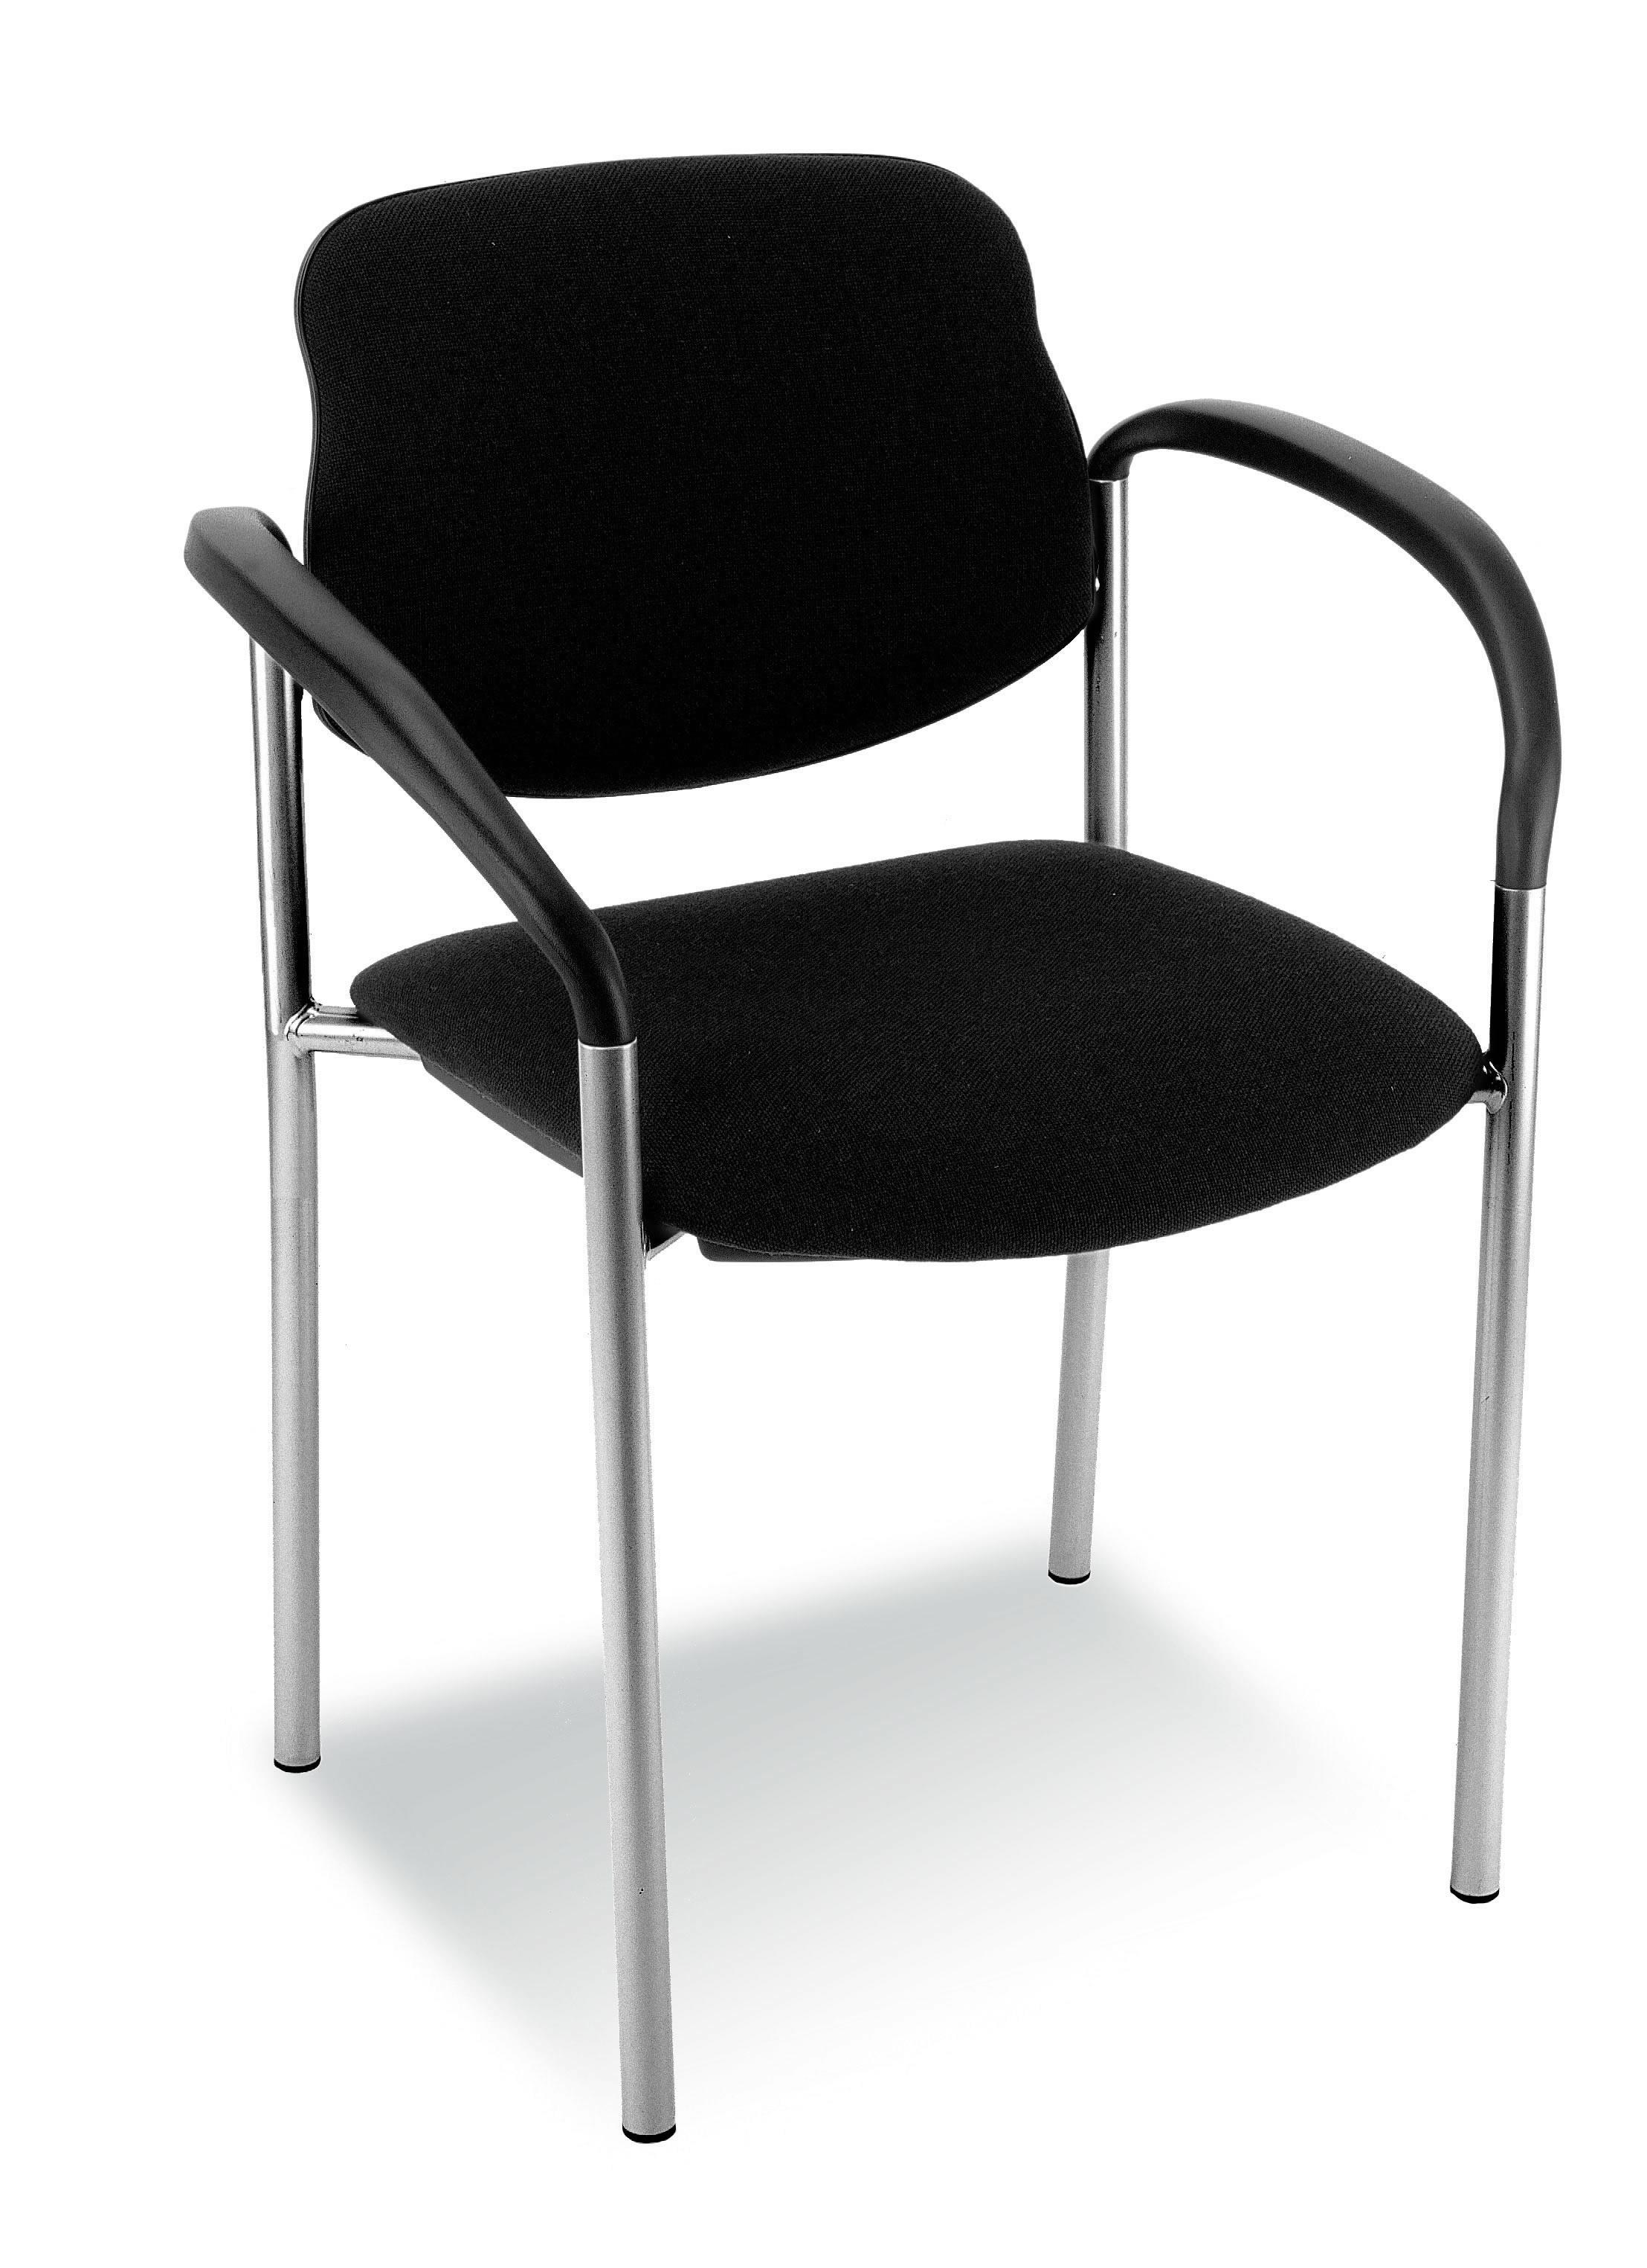 besucherstuhl sa vierfu verchromt armlehne sofort. Black Bedroom Furniture Sets. Home Design Ideas